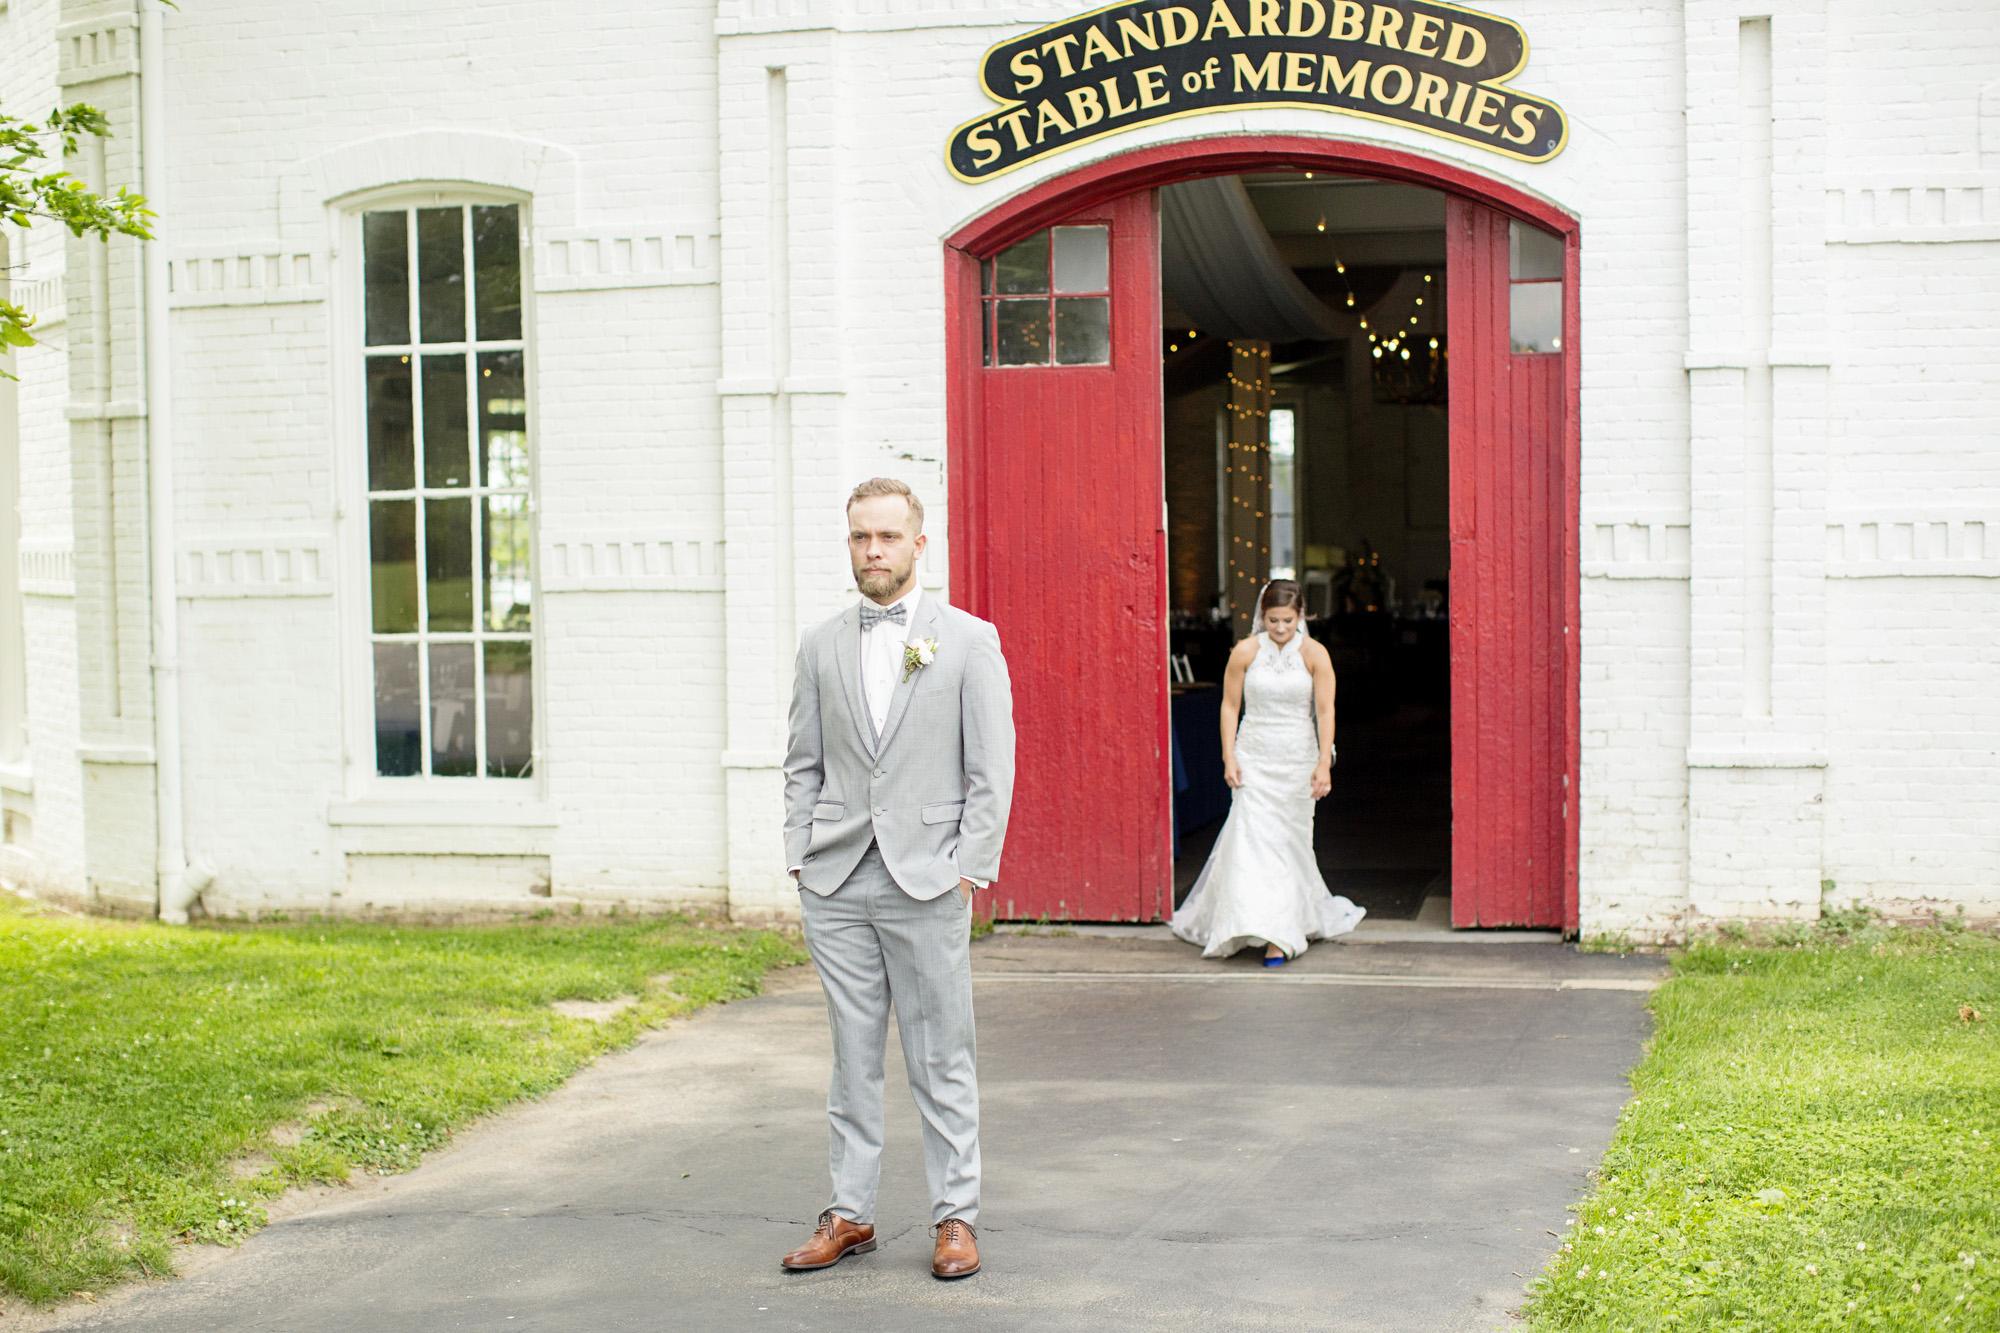 Seriously_Sabrina_Photography_Lexington_Kentucky_Round_Barn_Red_Mile_Stable_of_Memories_Wedding_Hart_36.jpg